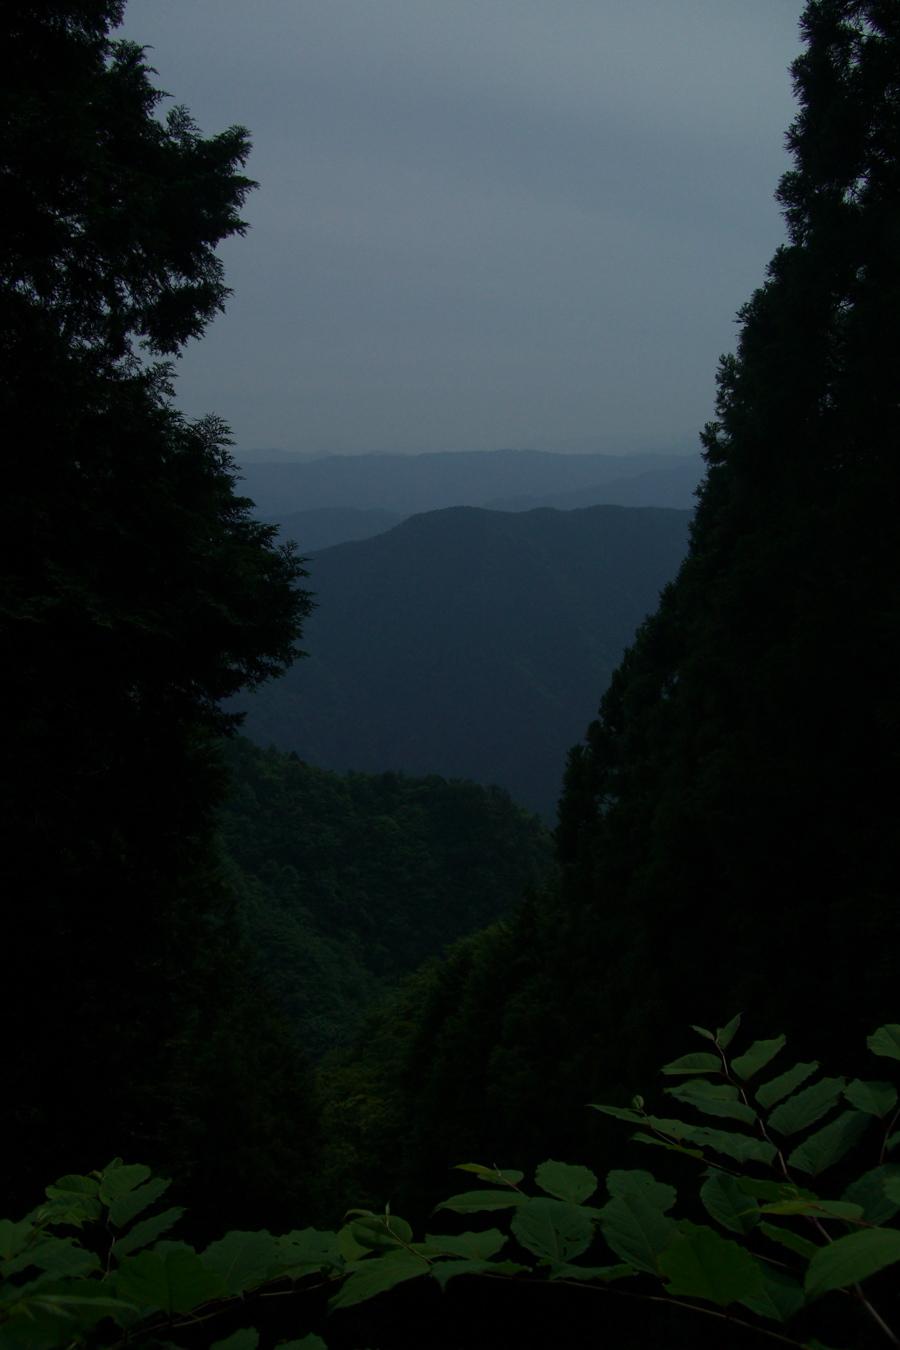 Nikko Mountain Biking-nokogiri-otake2.jpg